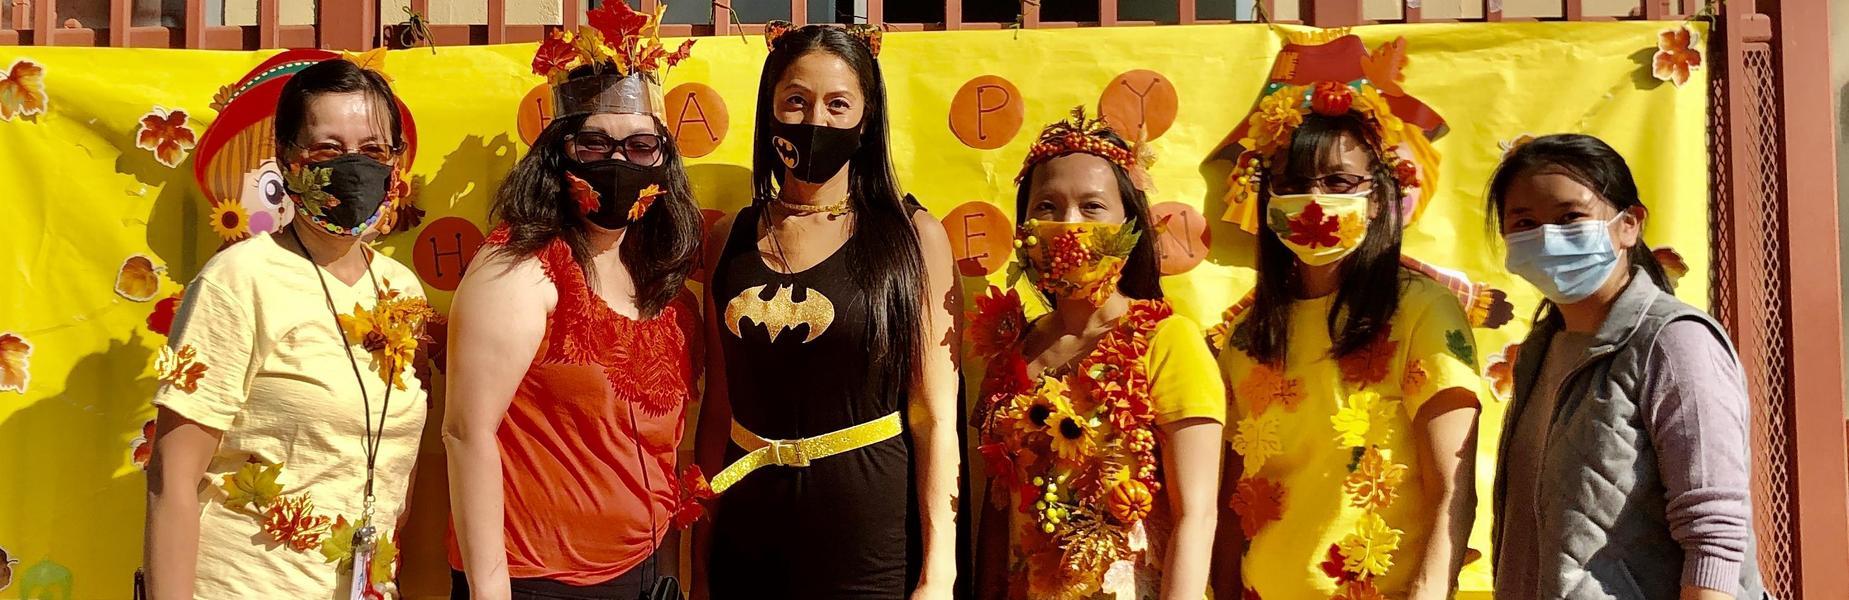 Ramona staff celebrate Halloween